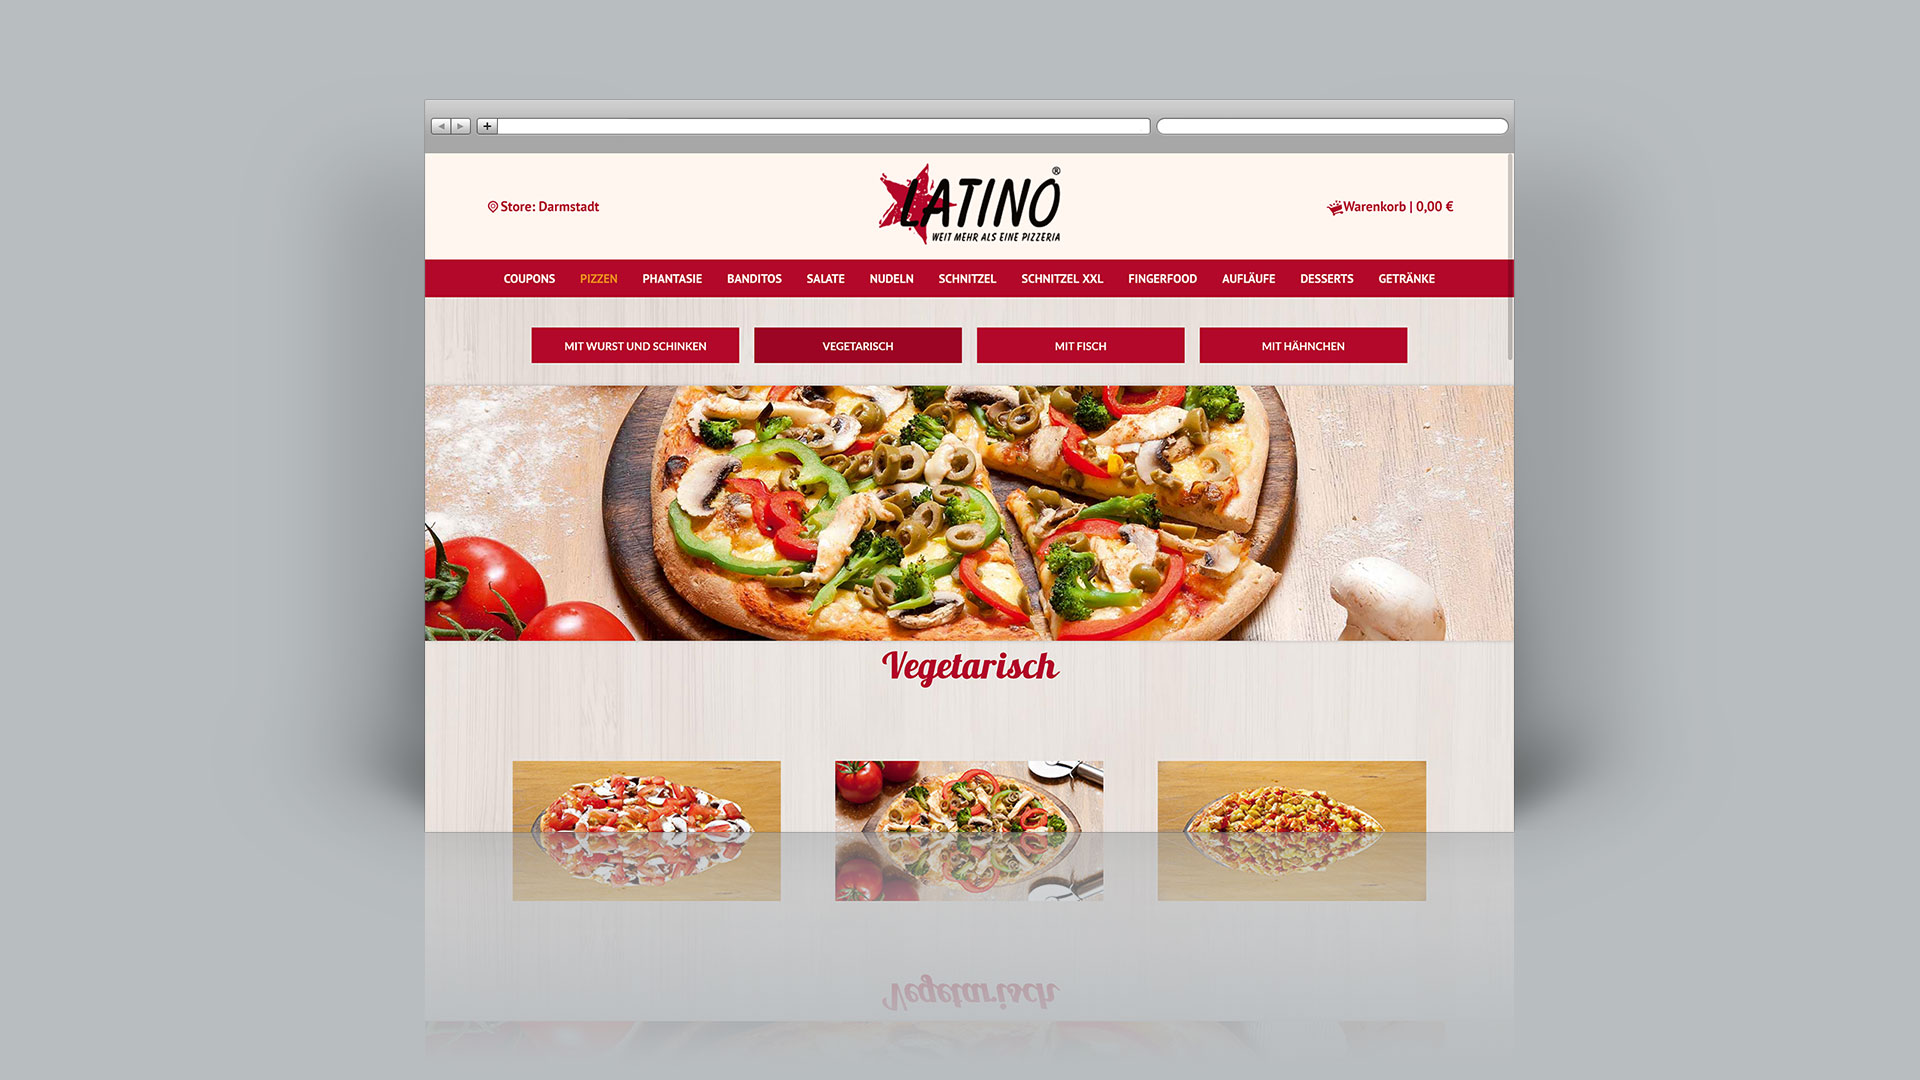 Latino Pizza Darmstadt